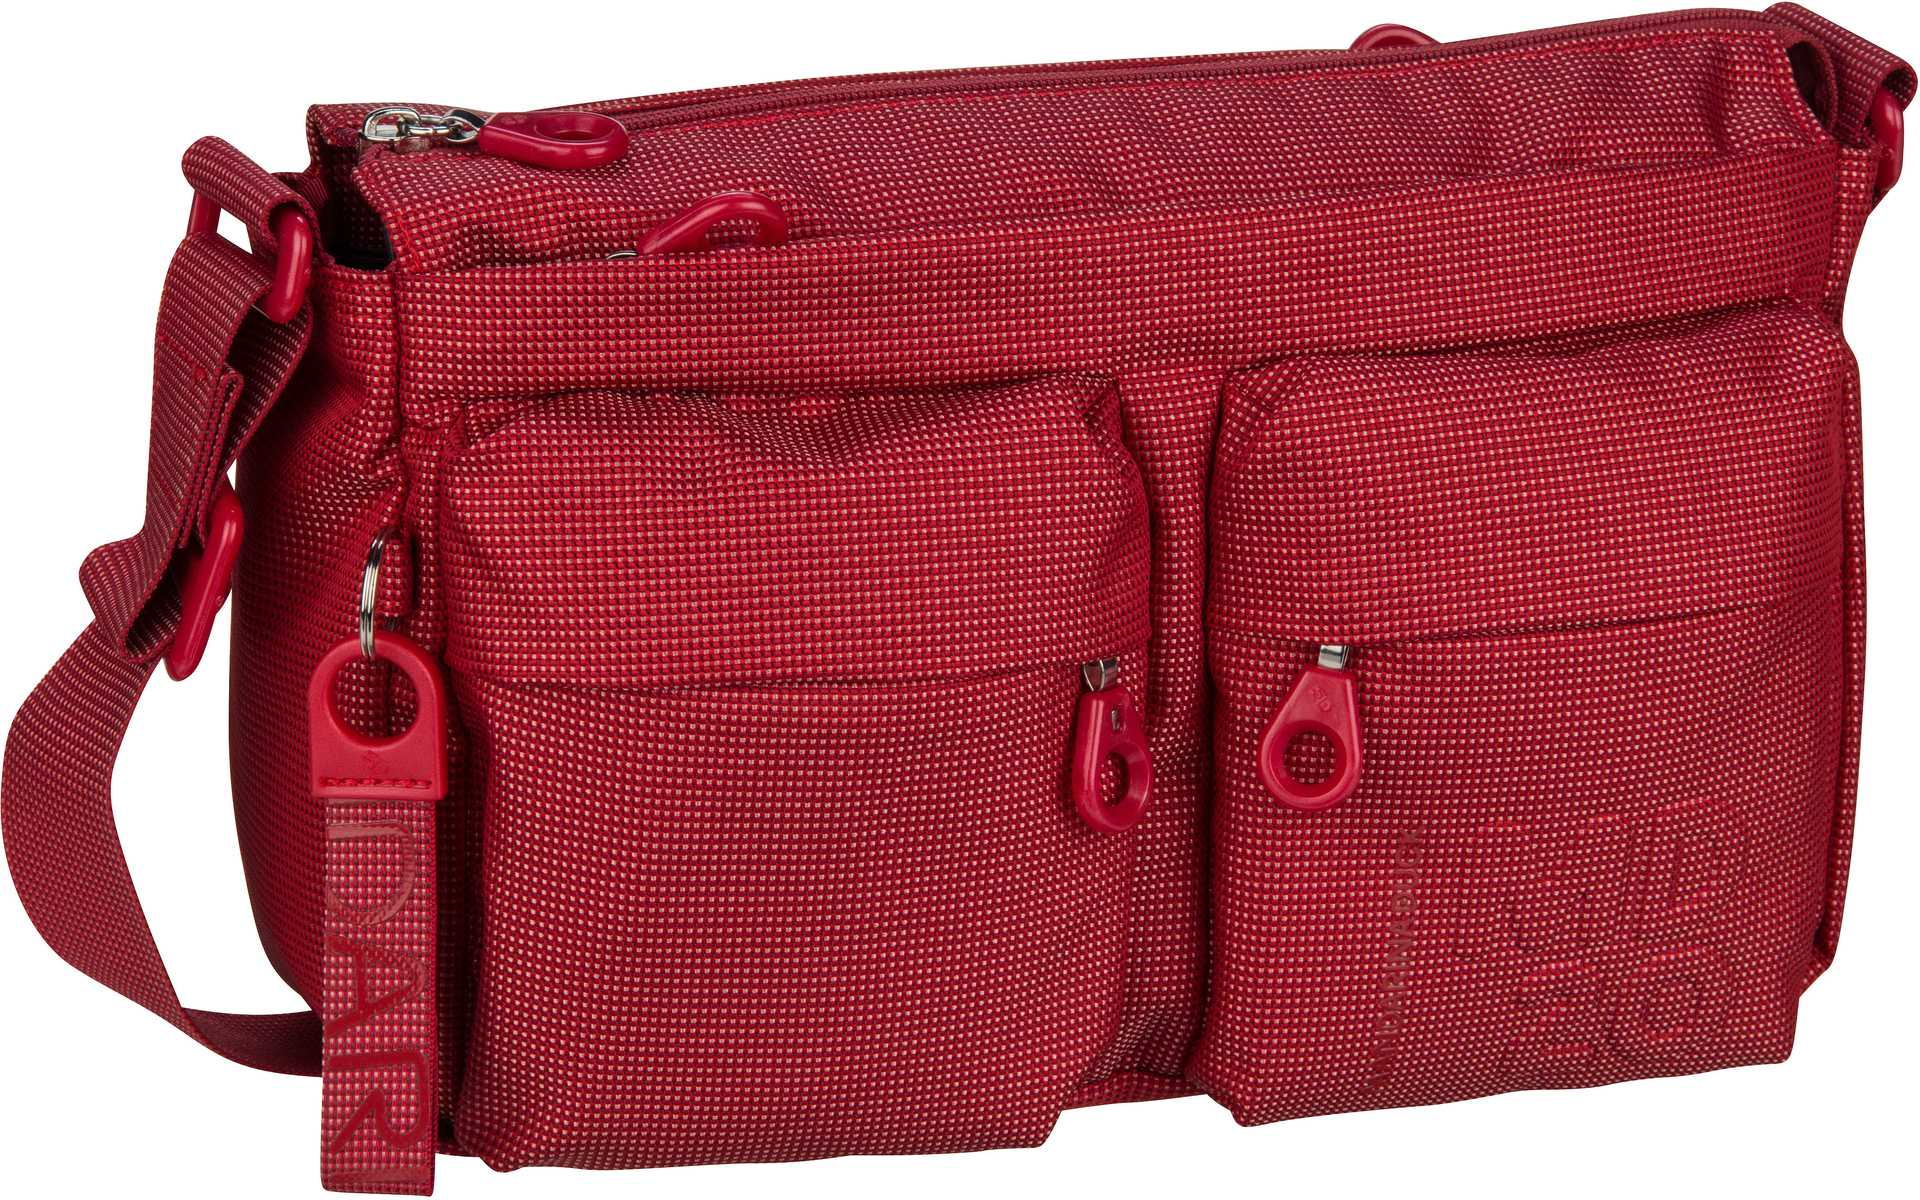 Umhängetasche MD20 Crossover Bag QMTX5 Flame Scarlet